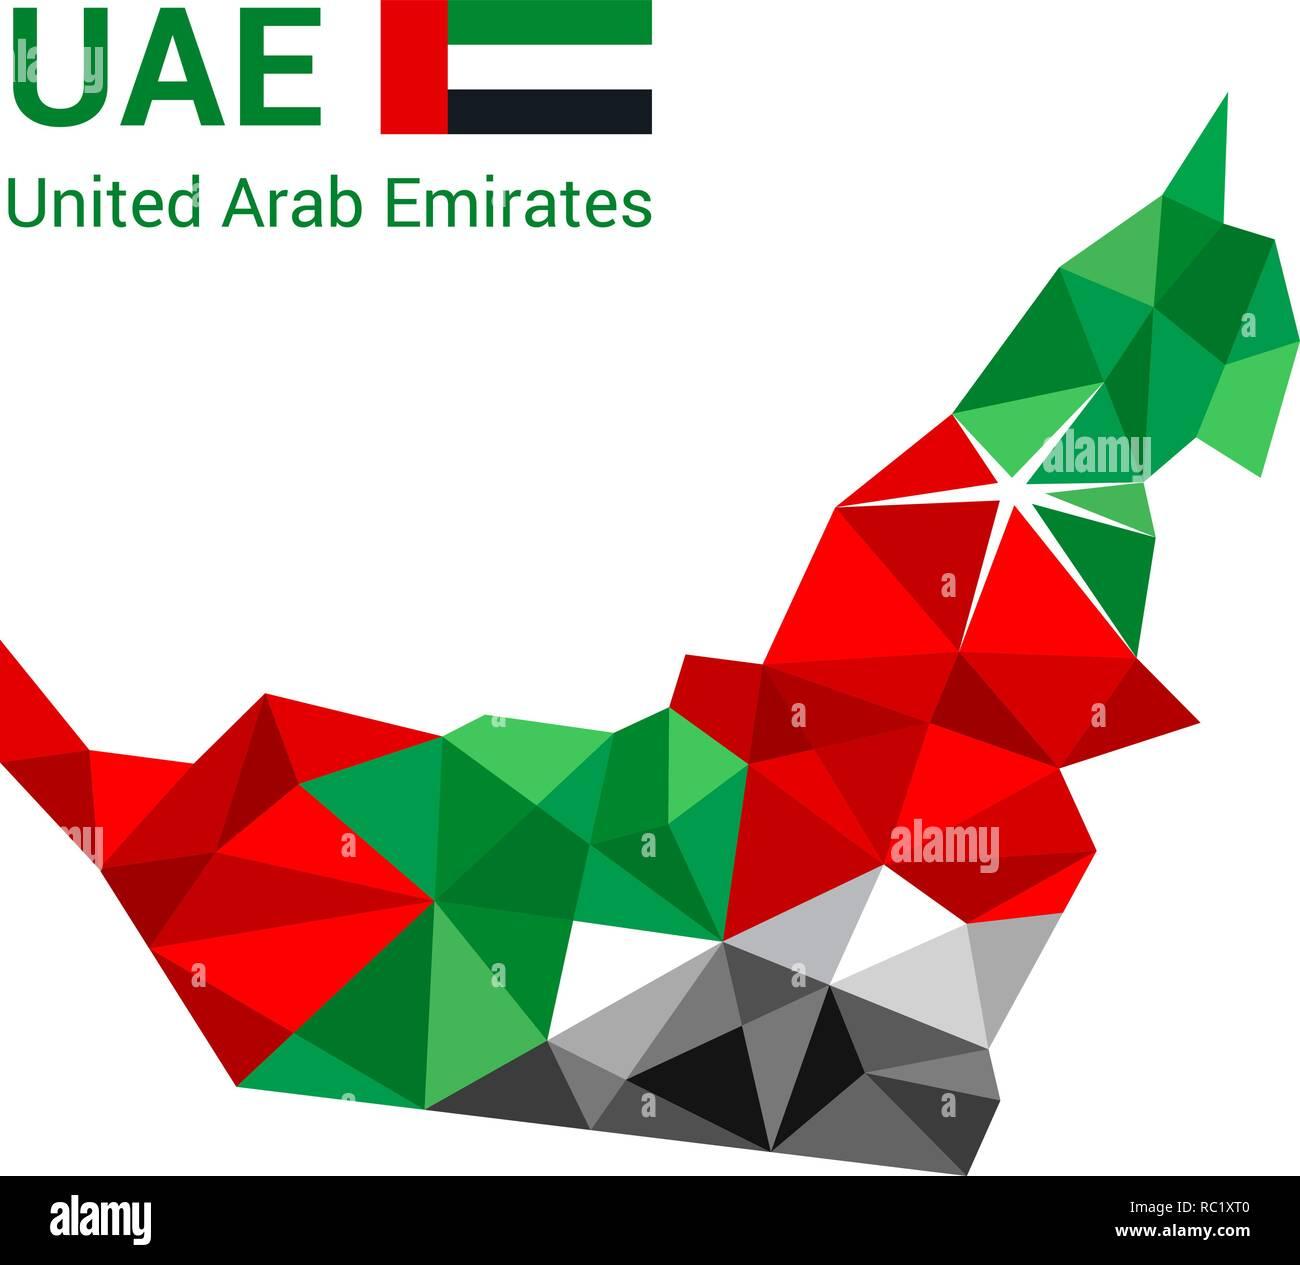 United Arab Emirates flag map in polygonal geometric style. - Stock Image